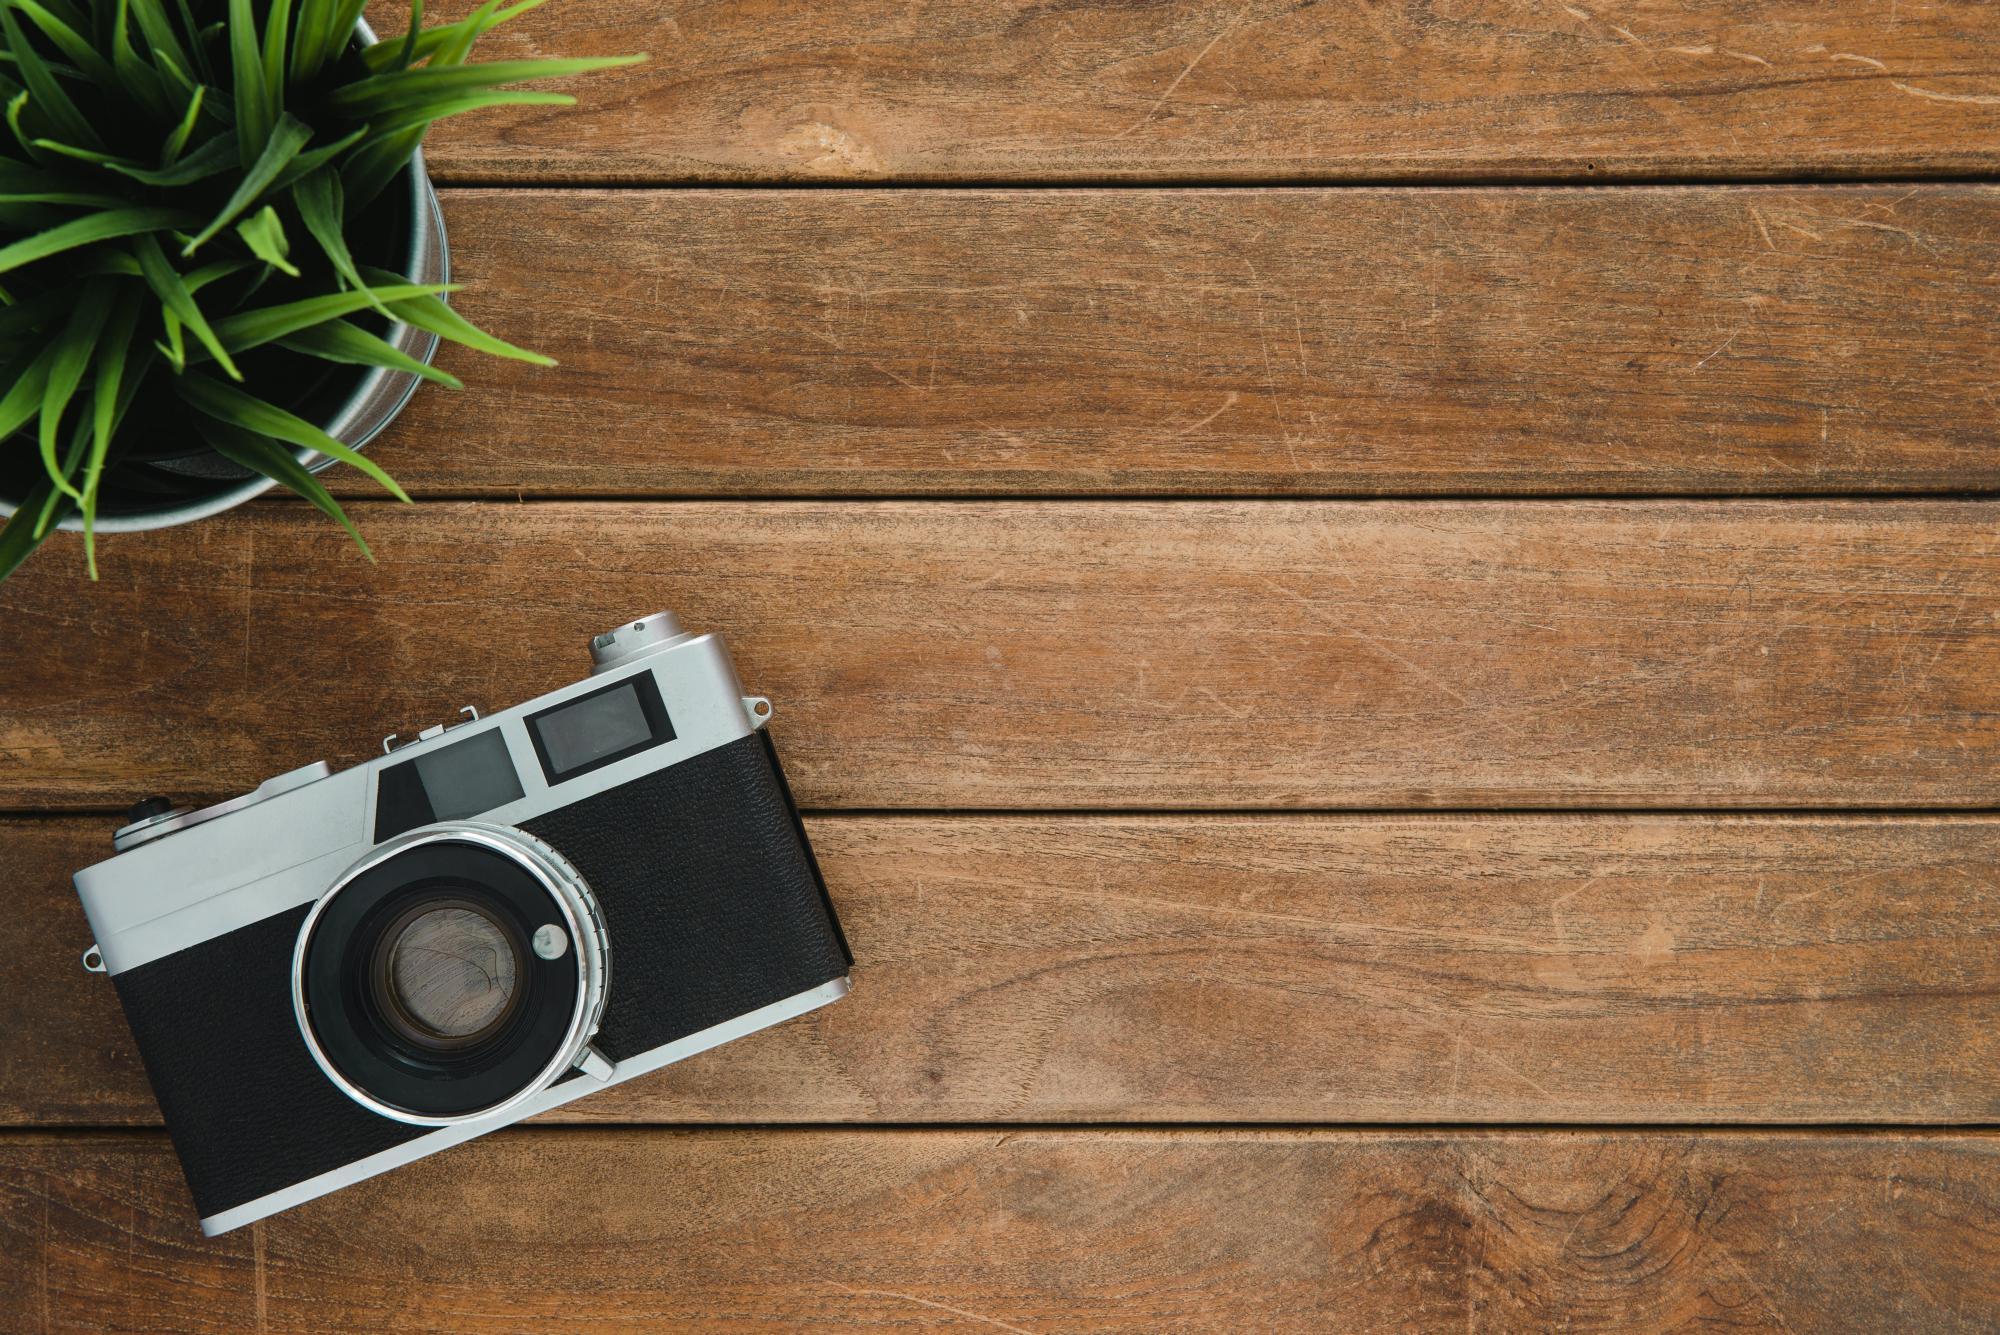 Image of a camera.